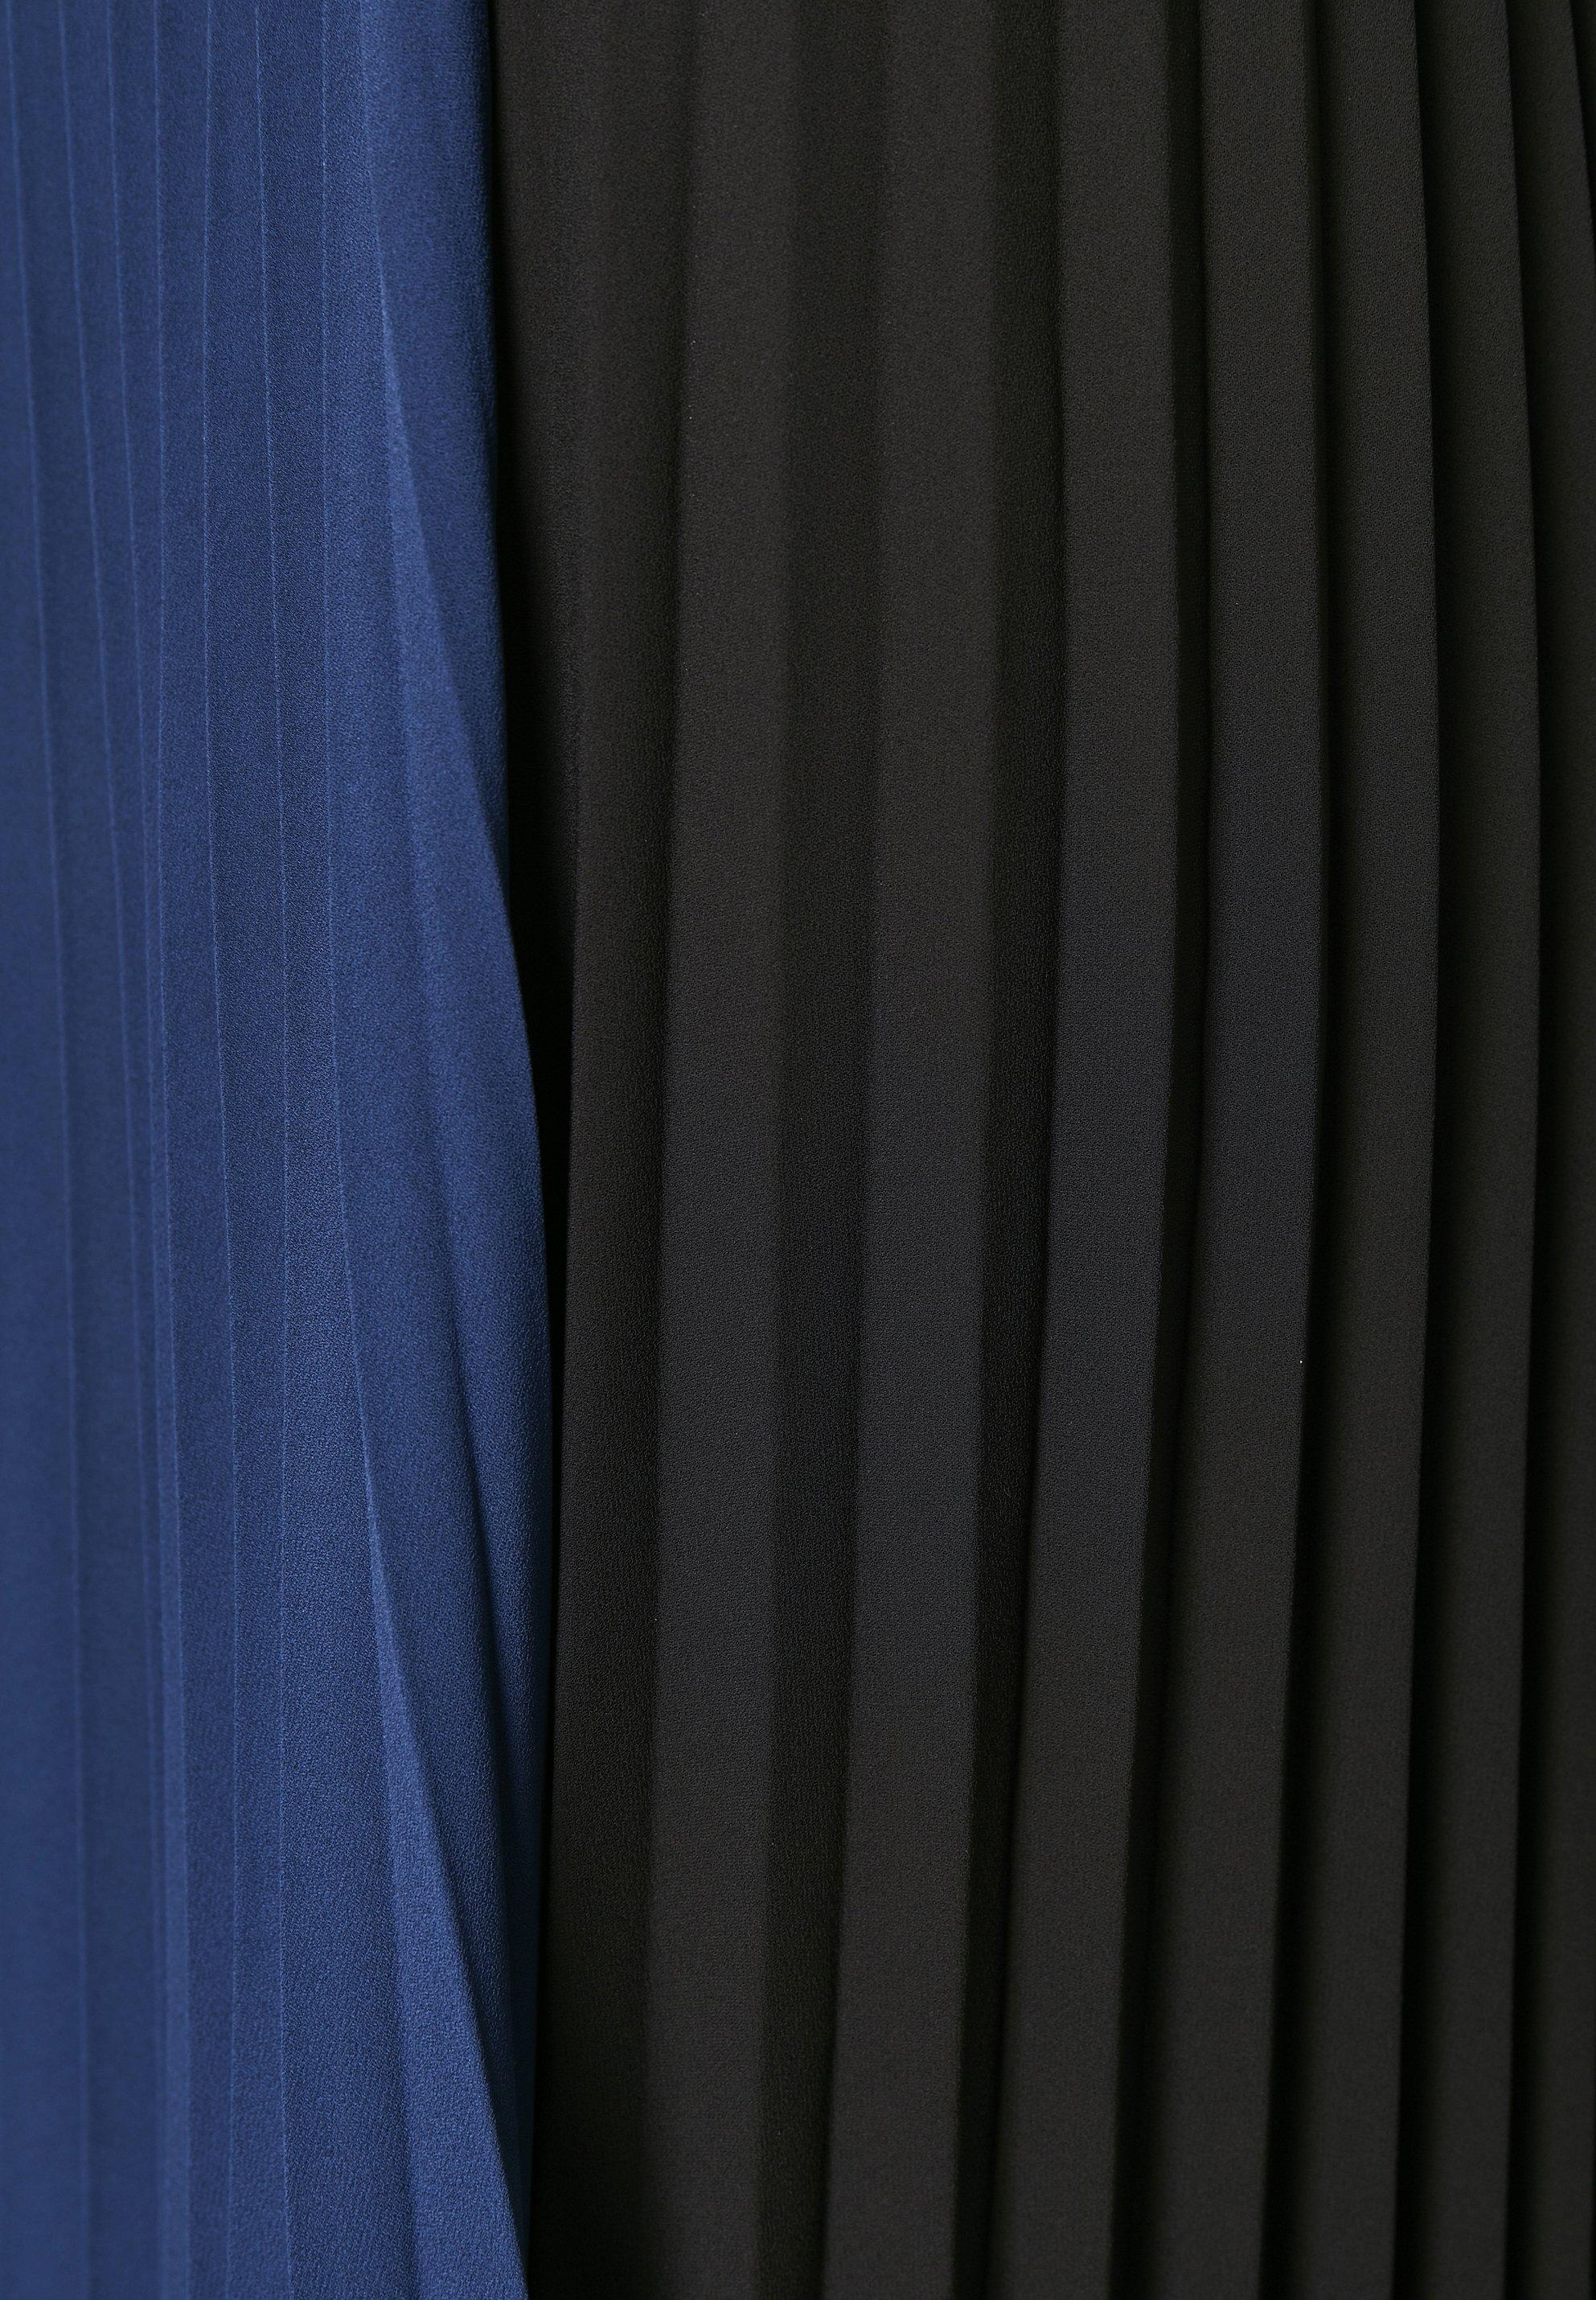 Shop Women's Clothing InWear FRANKAIW  A-line skirt ink blue/ black gqzqNZaTj